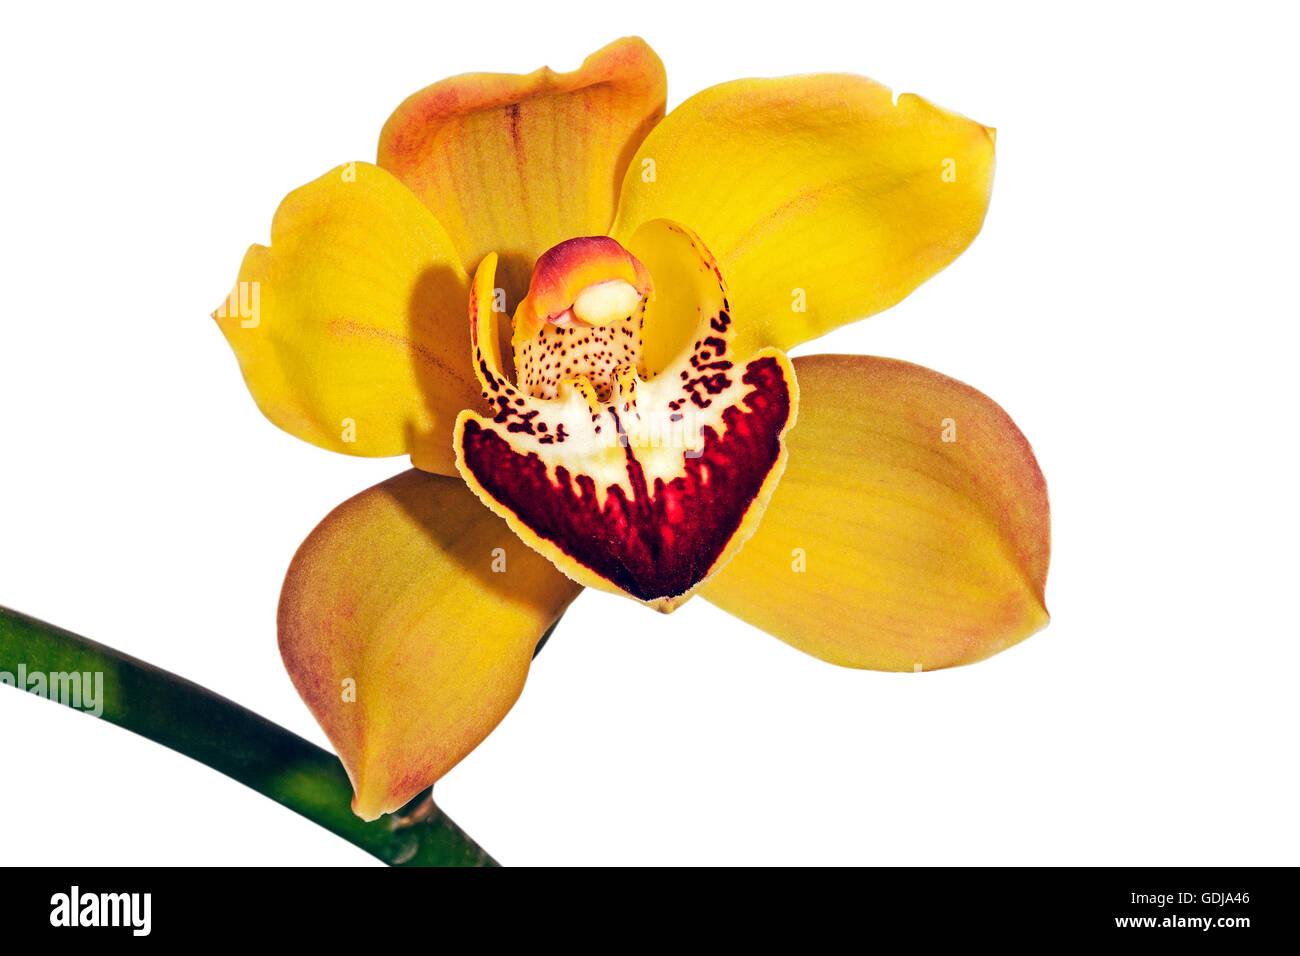 Studio shot of isolated single yellow and magenta cymbidium orchid flower on green stem on white - Stock Image